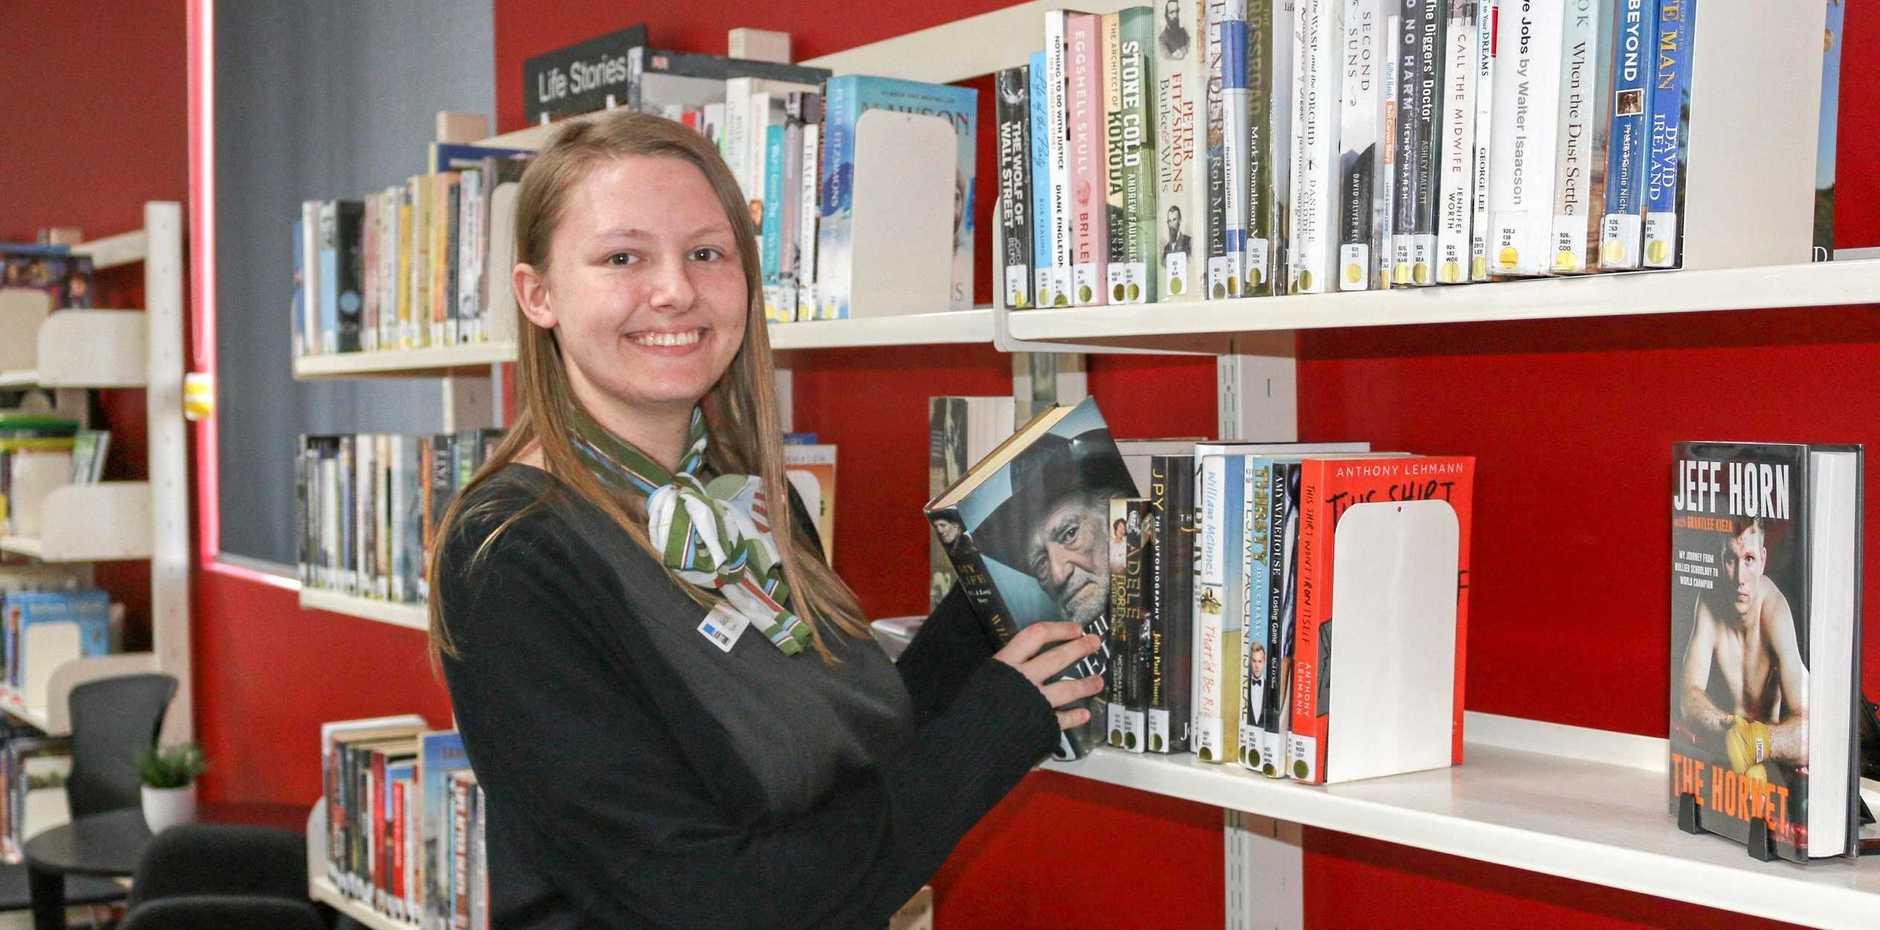 ON THE JOB: Library services trainee Alicia Streten.